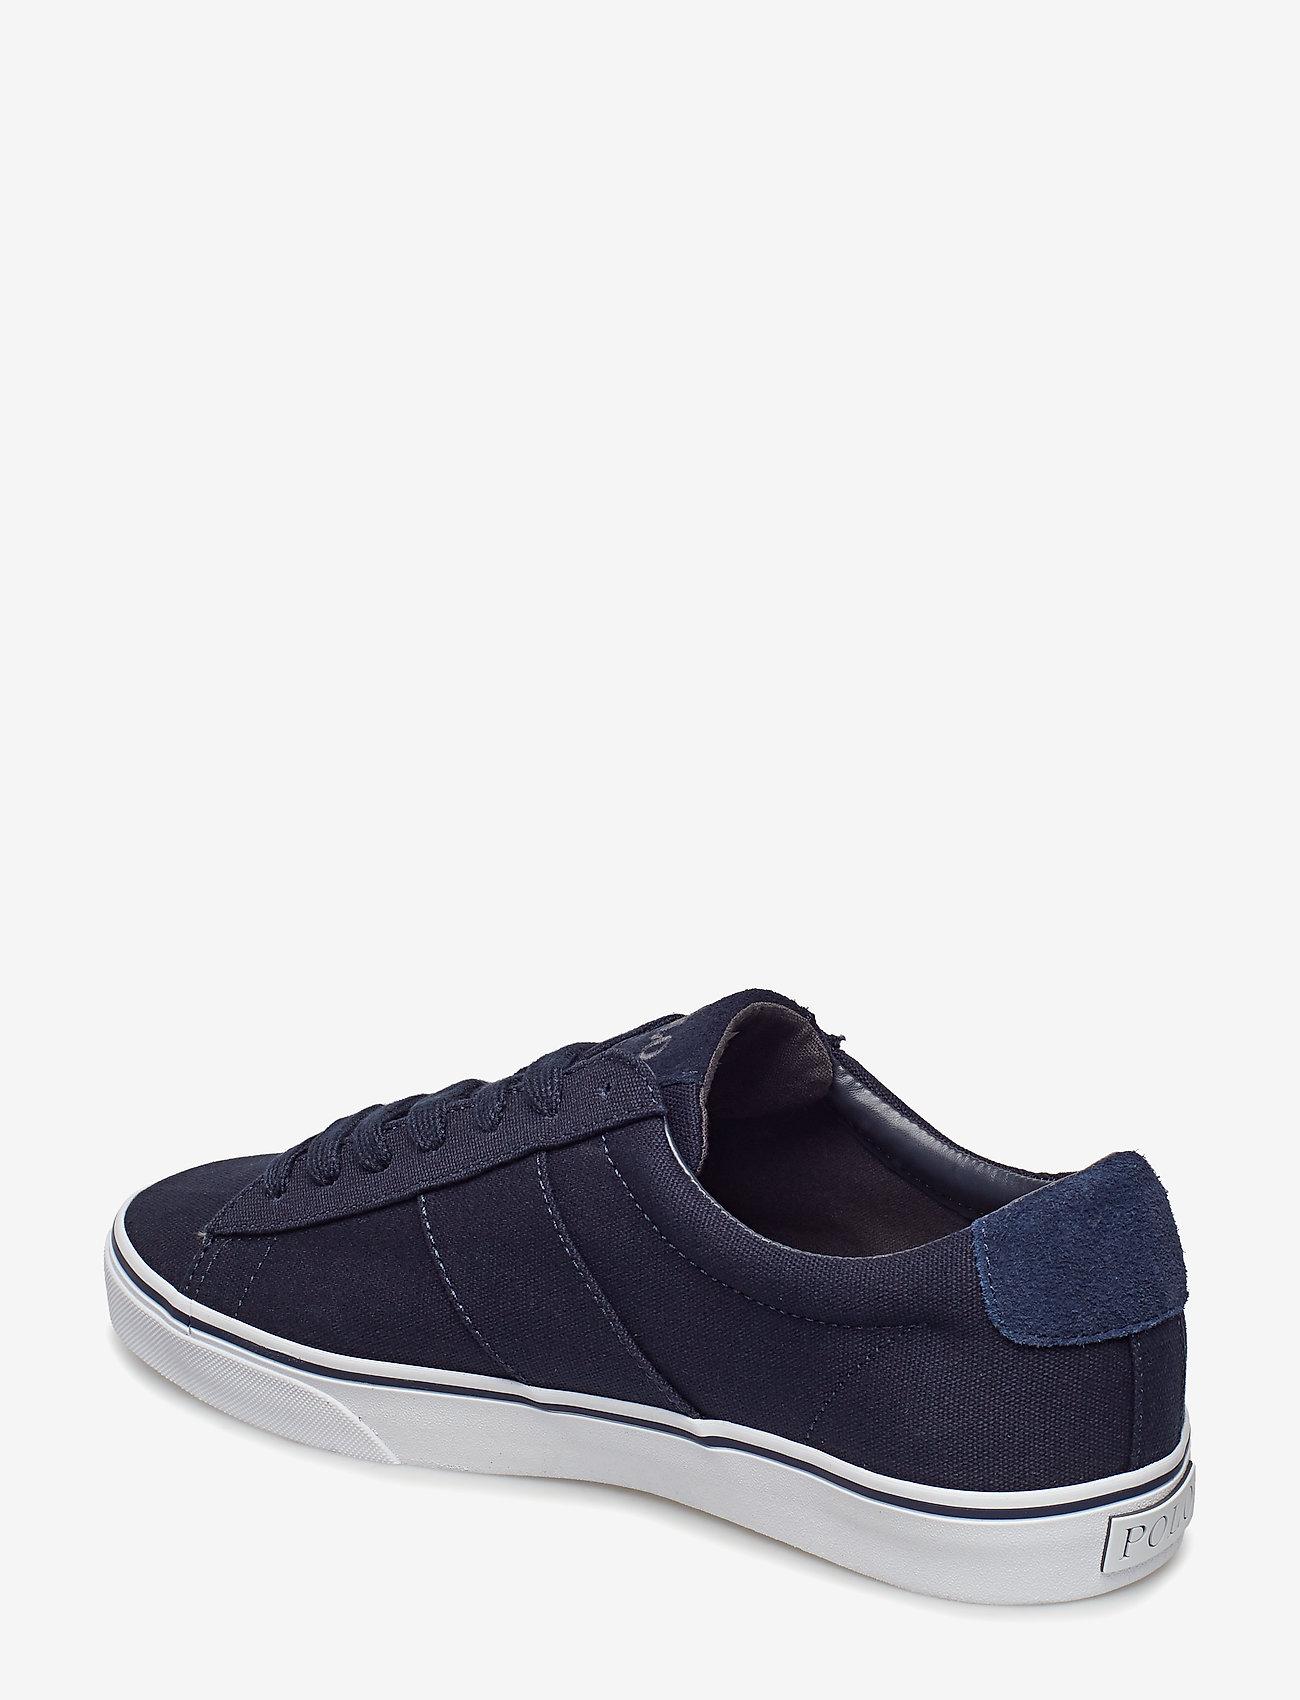 Polo Ralph Lauren Sayer Canvas Sneaker - Sneakers AVIATOR NAVY - Schuhe Billige